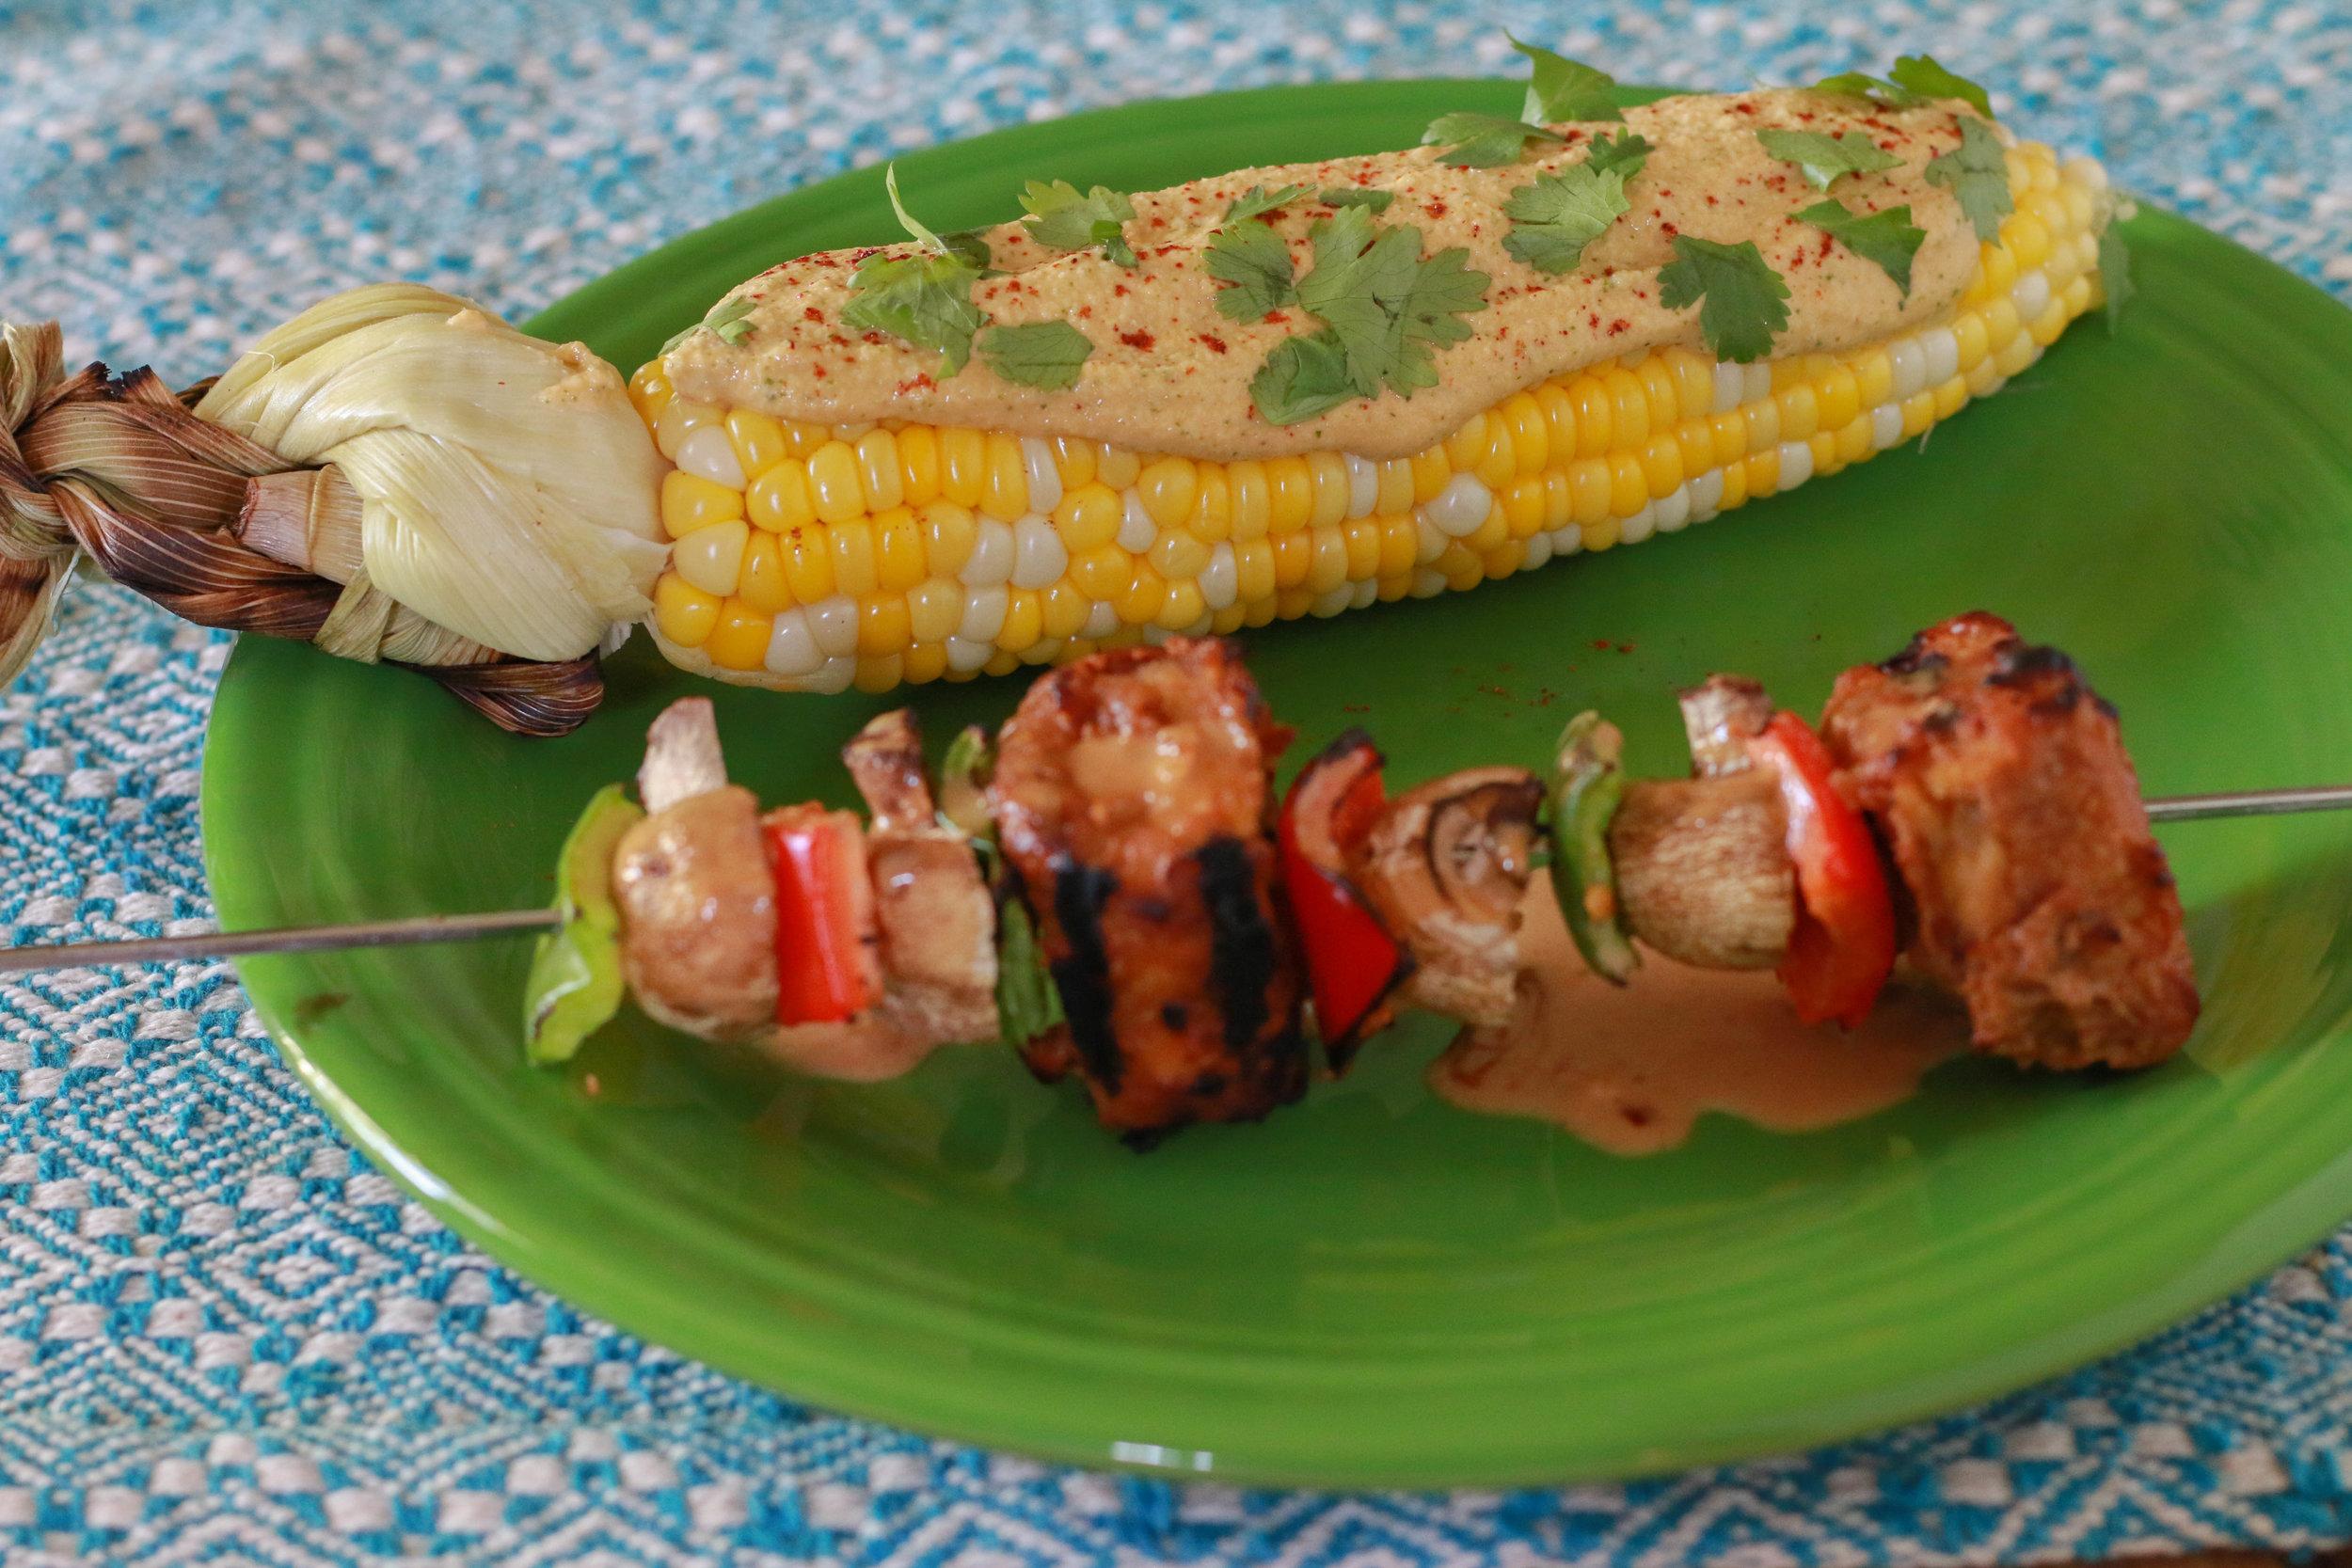 Tempeh Veggie Kabobs with peanut sauce! Recipe coming soon!